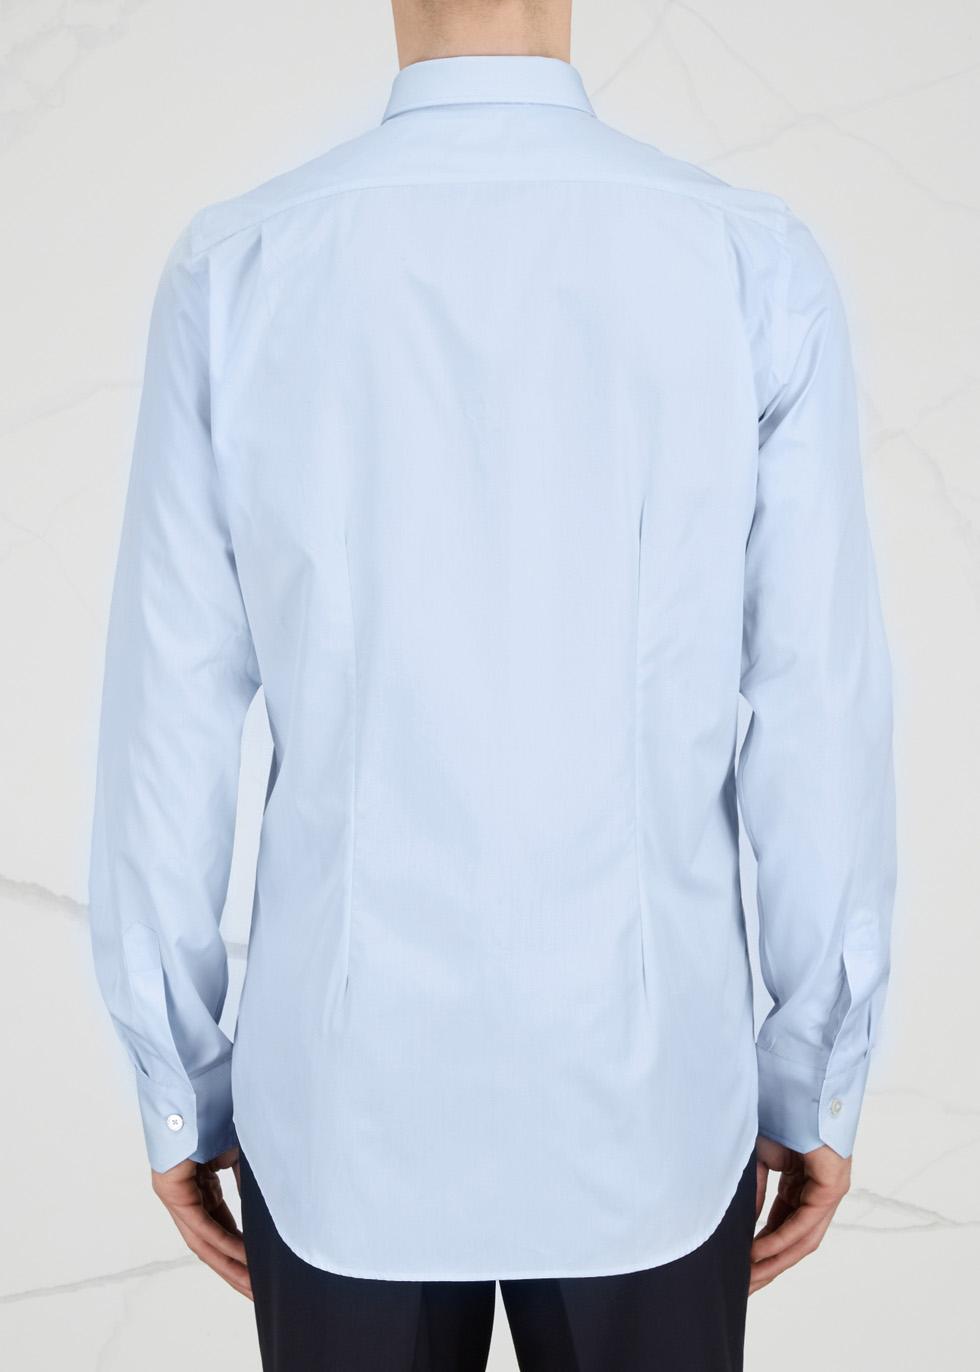 Soho light blue cotton shirt - Paul Smith